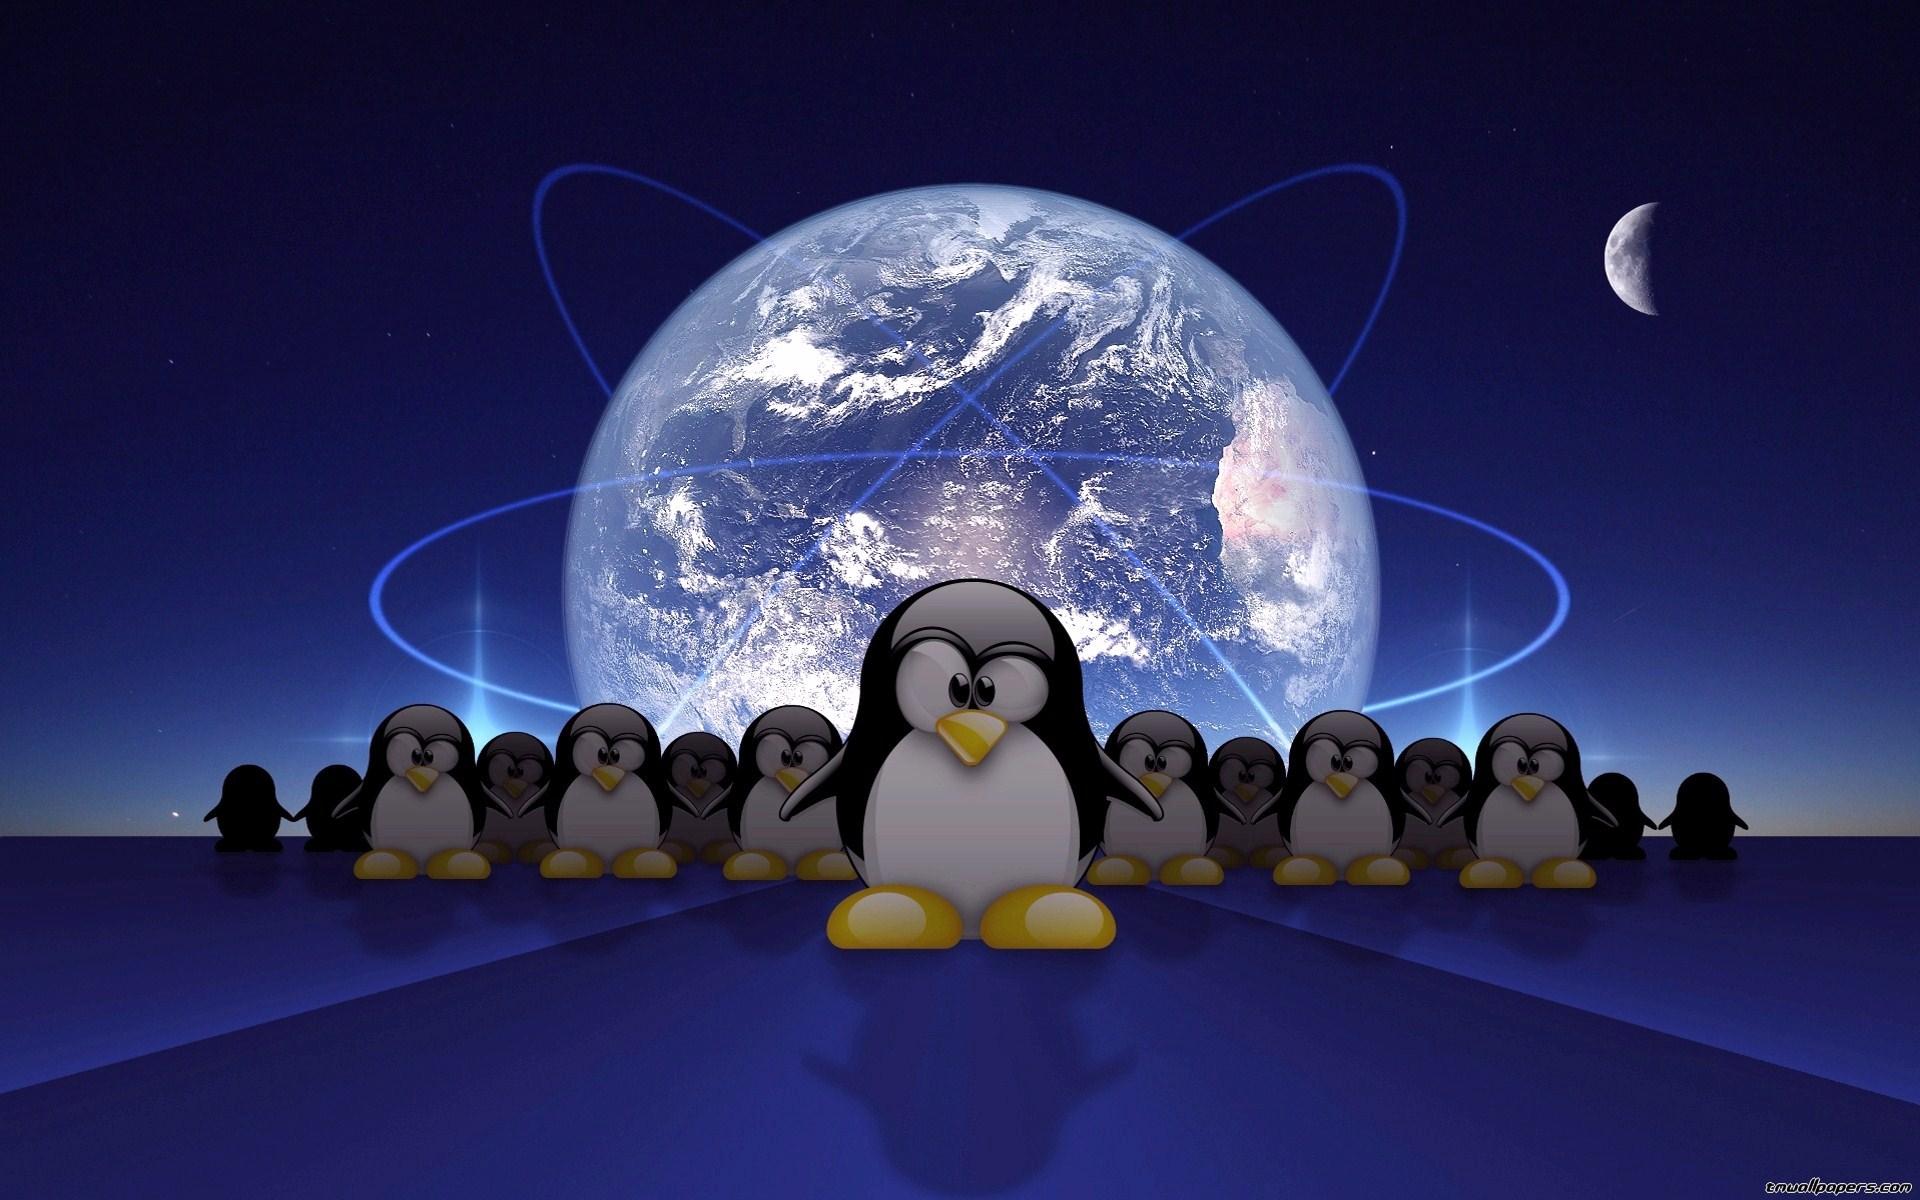 Linux Wallpaper 1366X768 wallpaper   842703 1920x1200